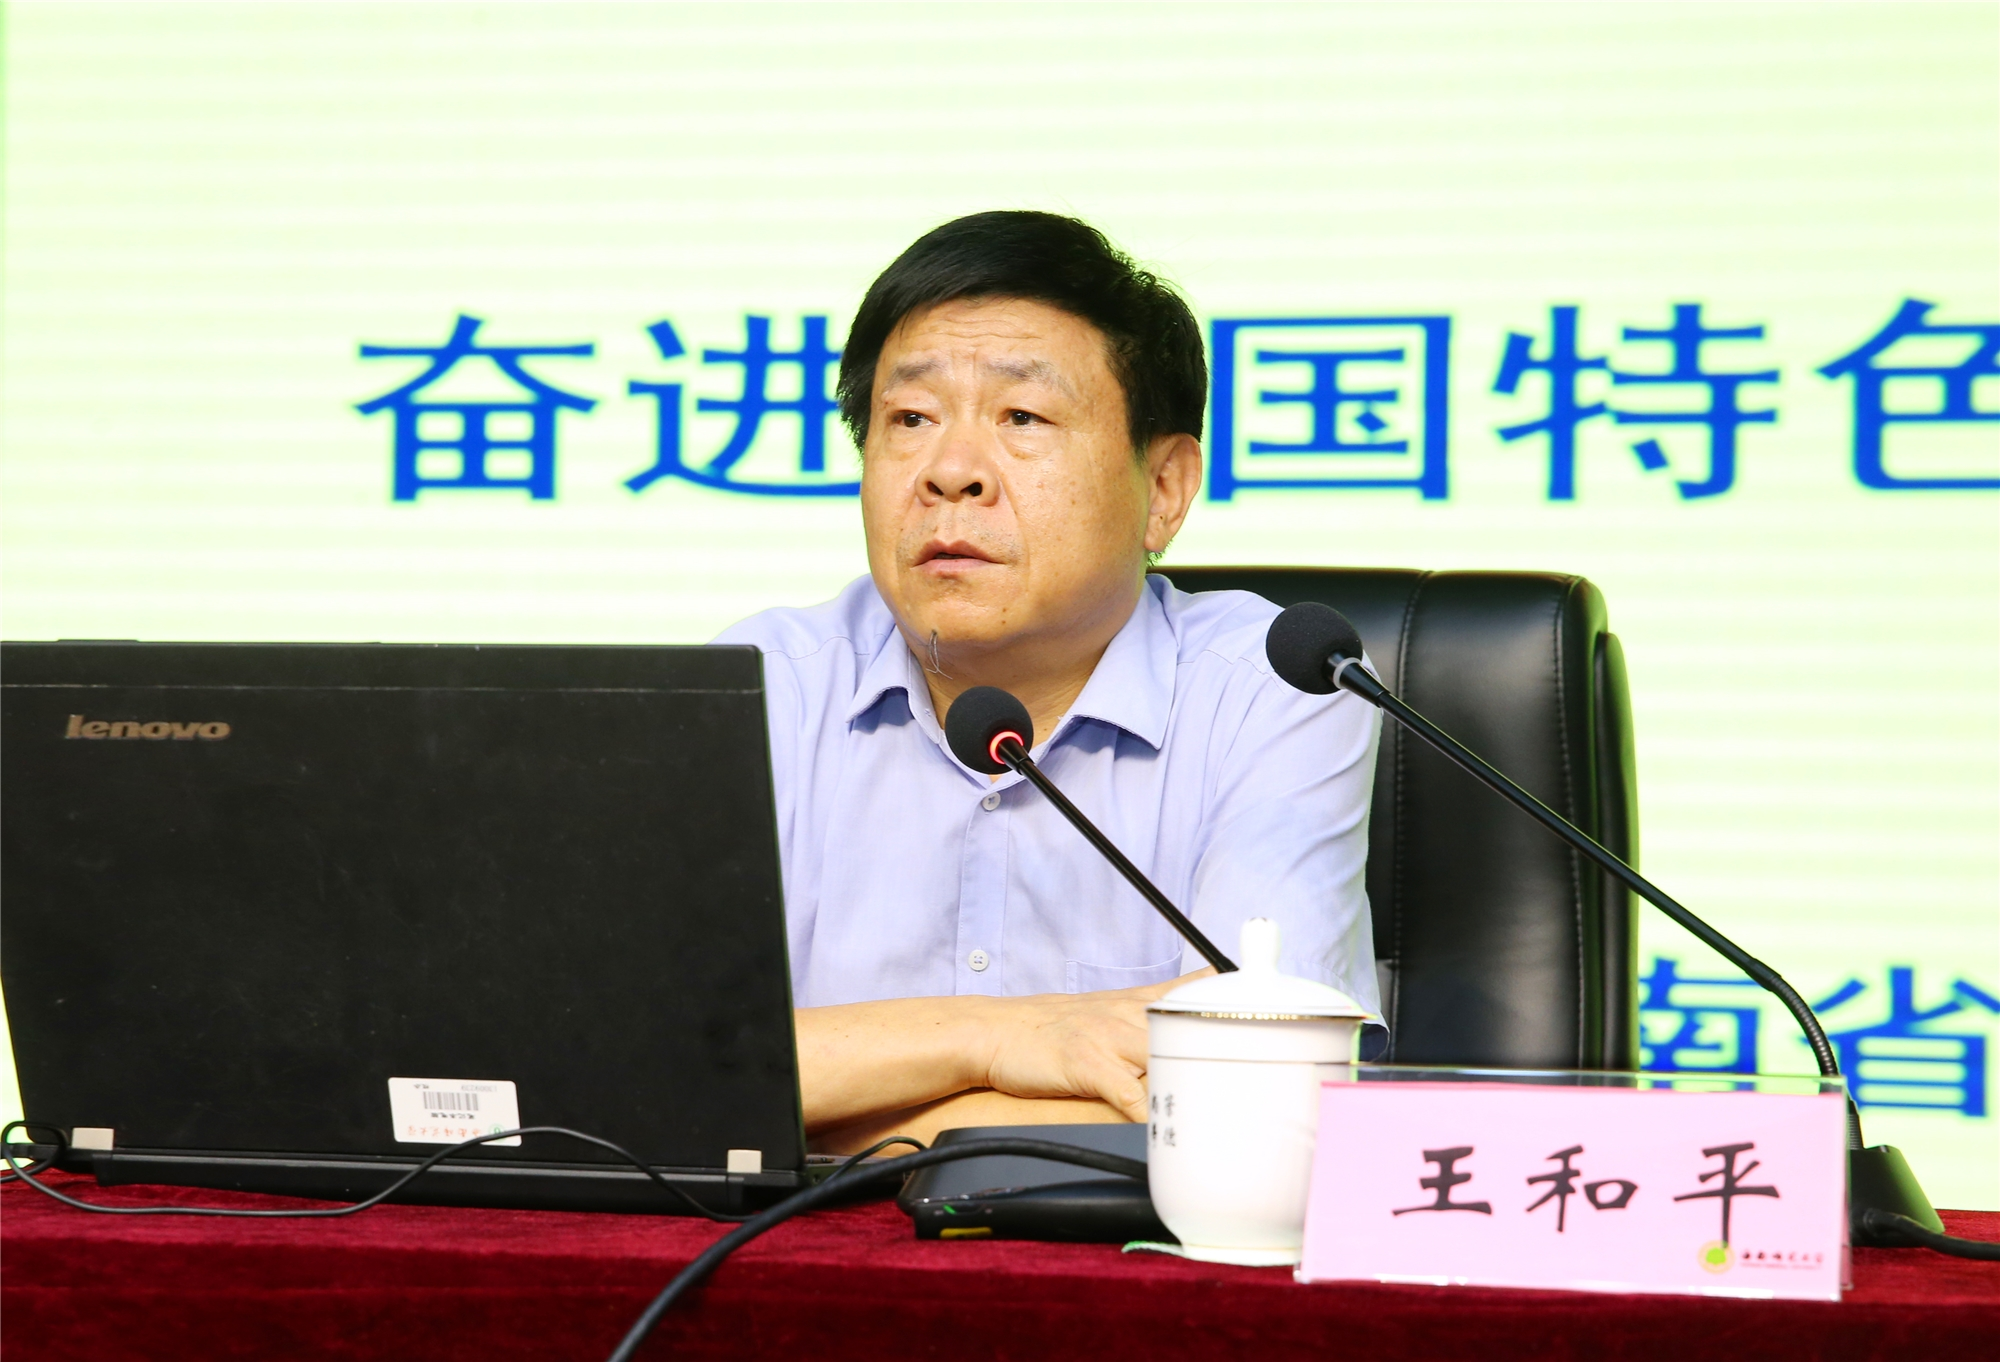 bbin体育真人平台在举办《回顾伟大历程 珍惜辉煌成就 奋进中国特色社会主义新时代》的专题报告会